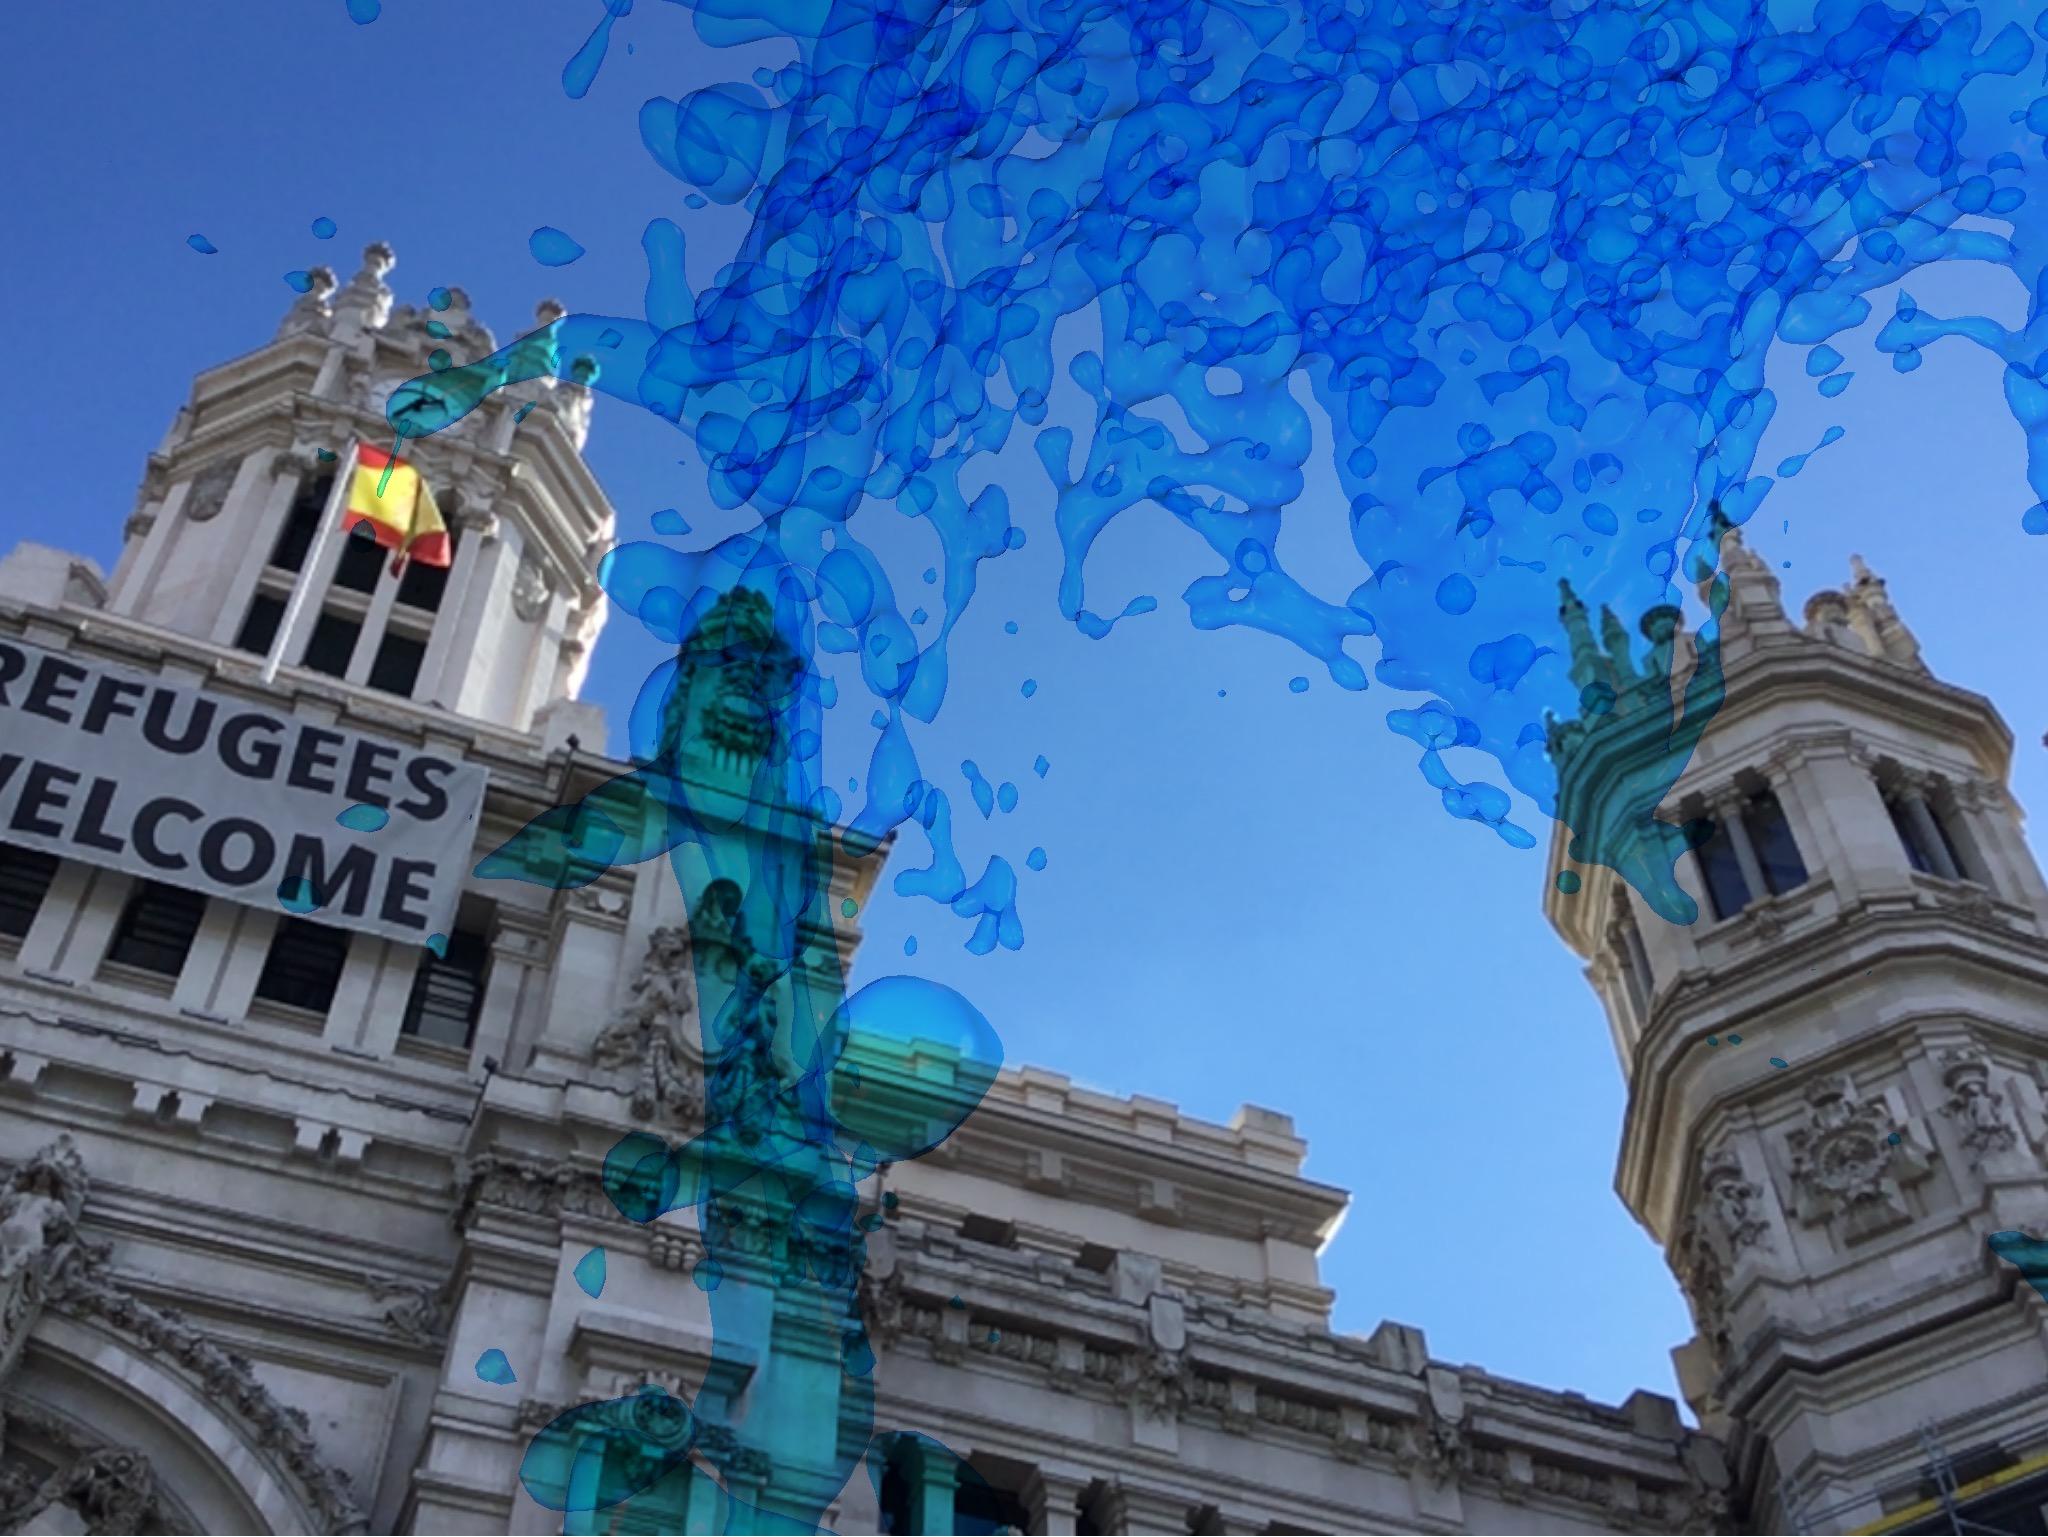 Aran-augmented-reality-art-network-developed-by-nemaniax.com-cibeles-madrid